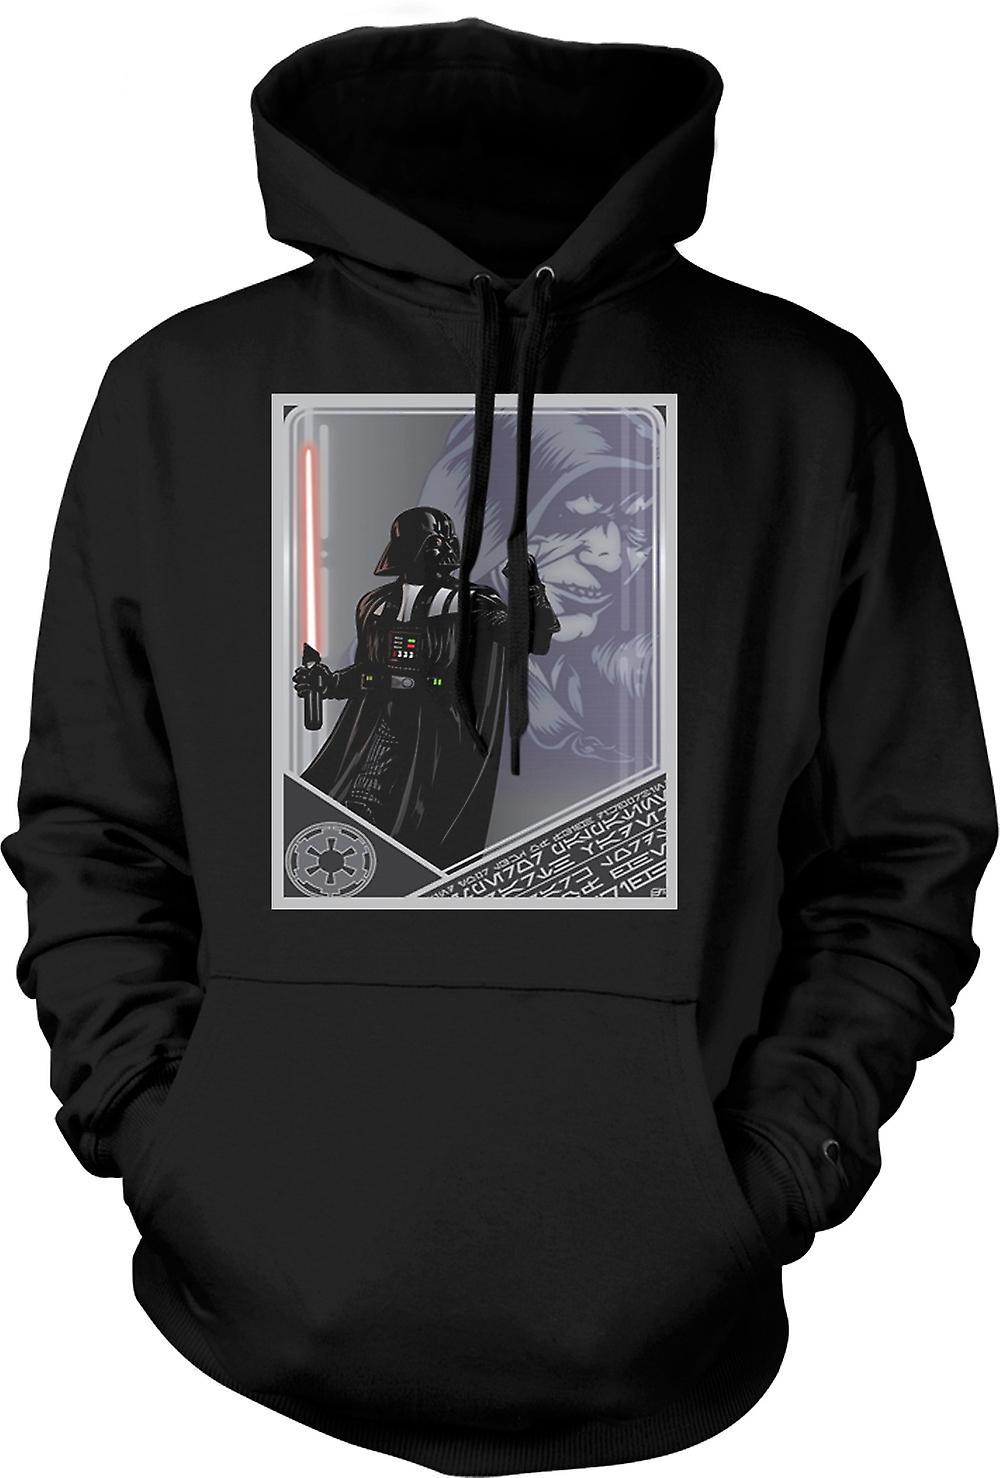 Mens Hoodie - Darth Vader & Palpatine - japanska